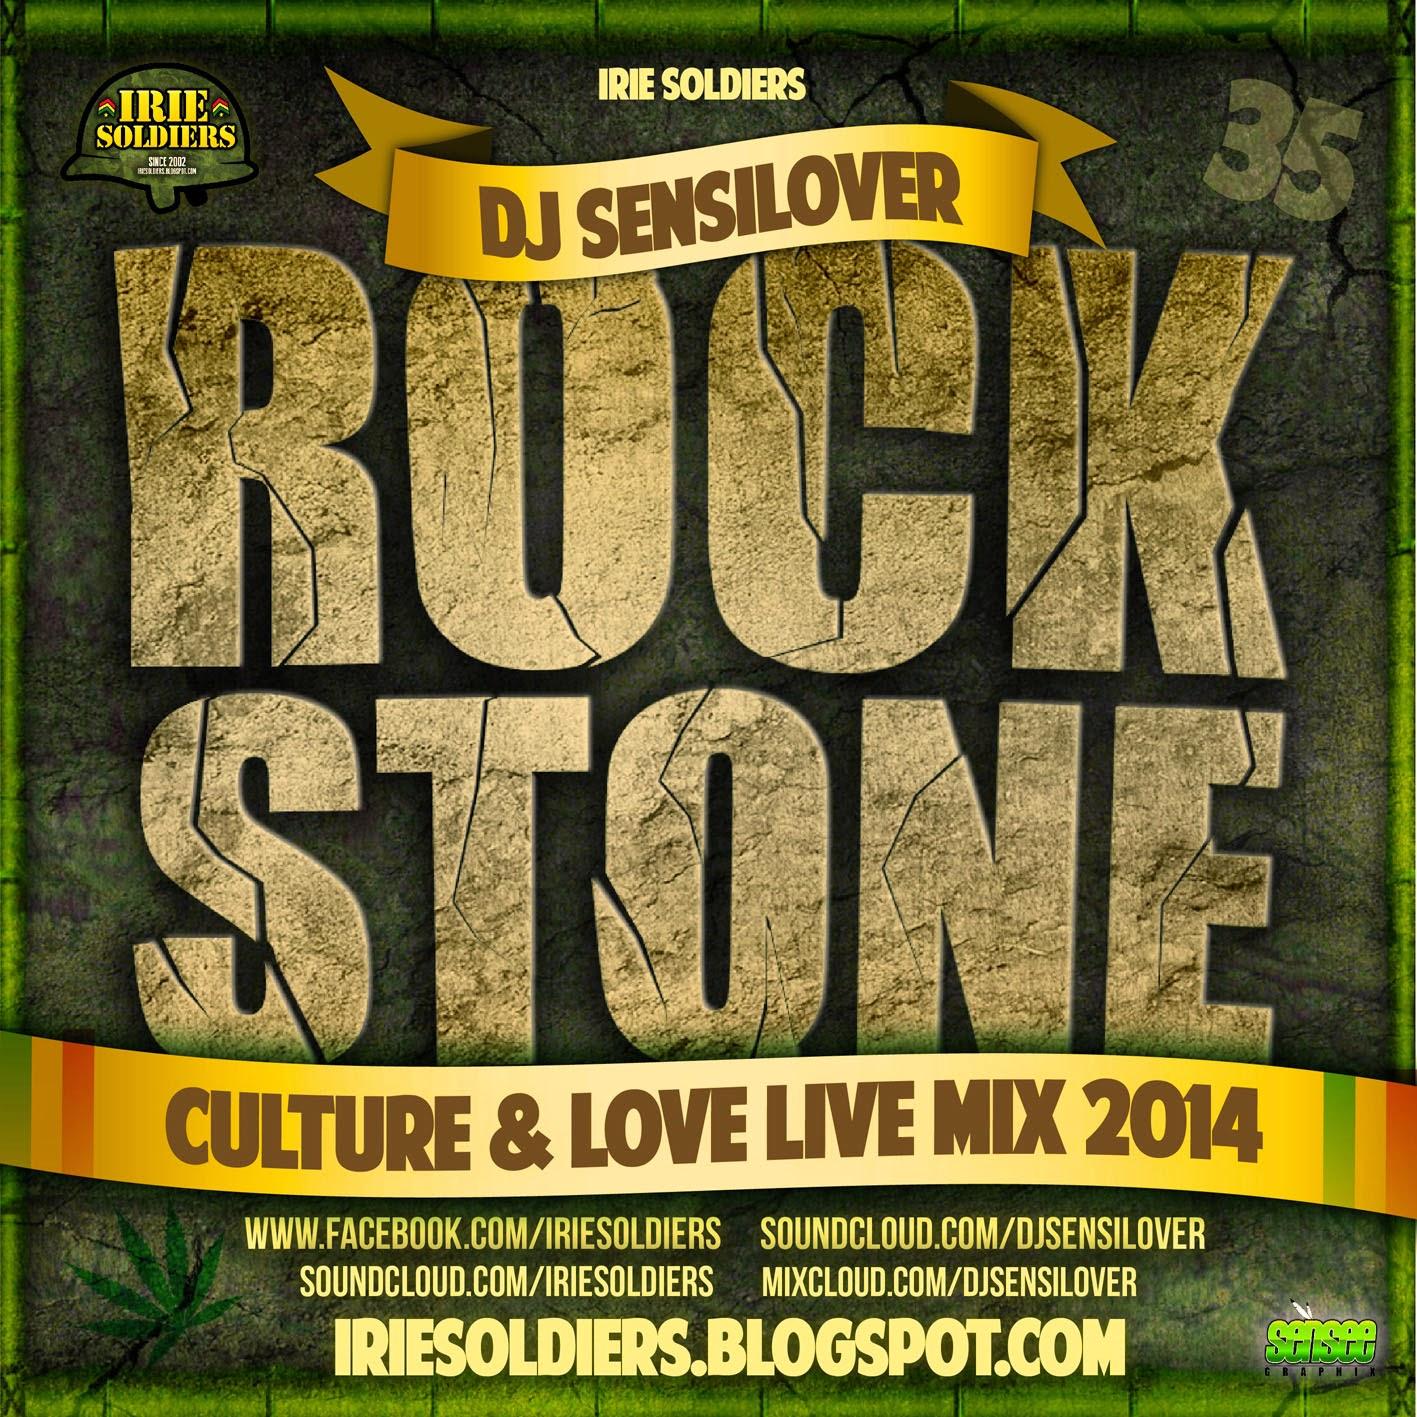 ROCKSTONE ✨ #35 Culture&Love Live Mix Sept 2014 DJSENSILOVER | IRIE